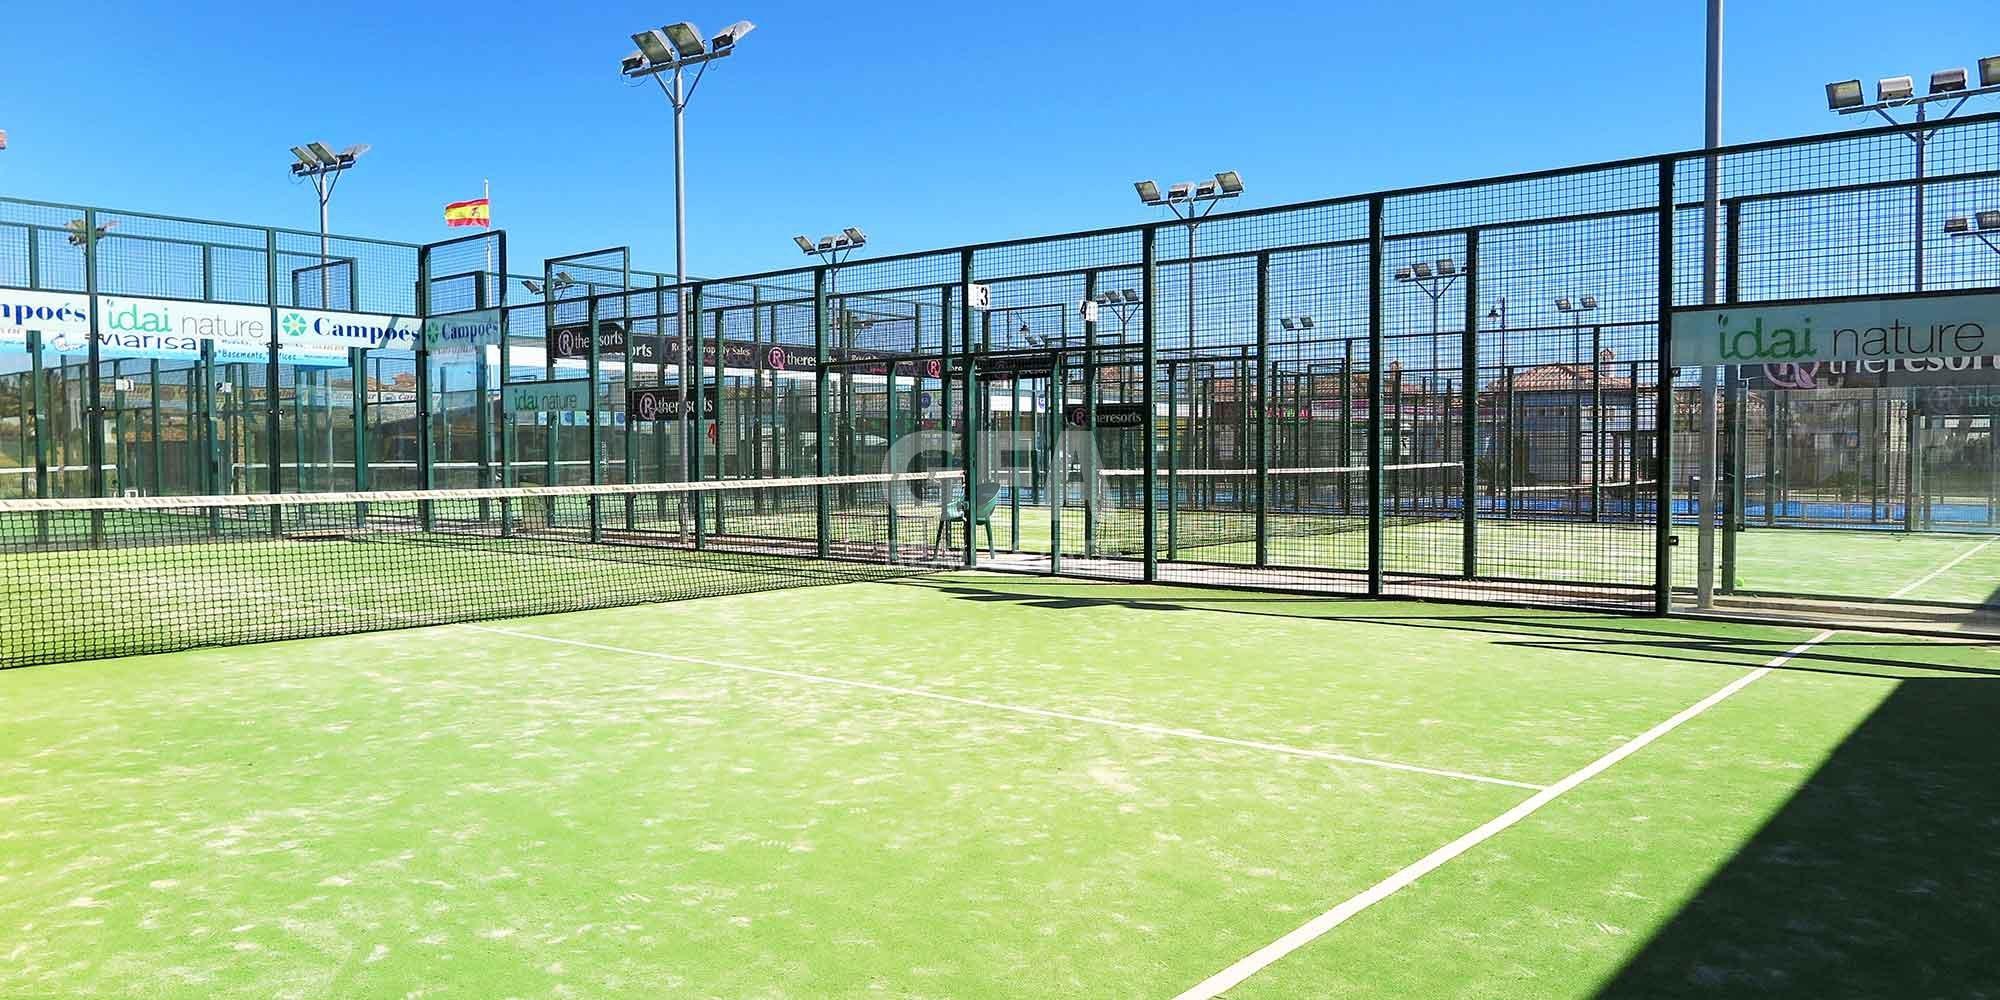 Residencial obra nueva Mar Menor Golf Resort  pista de pádel